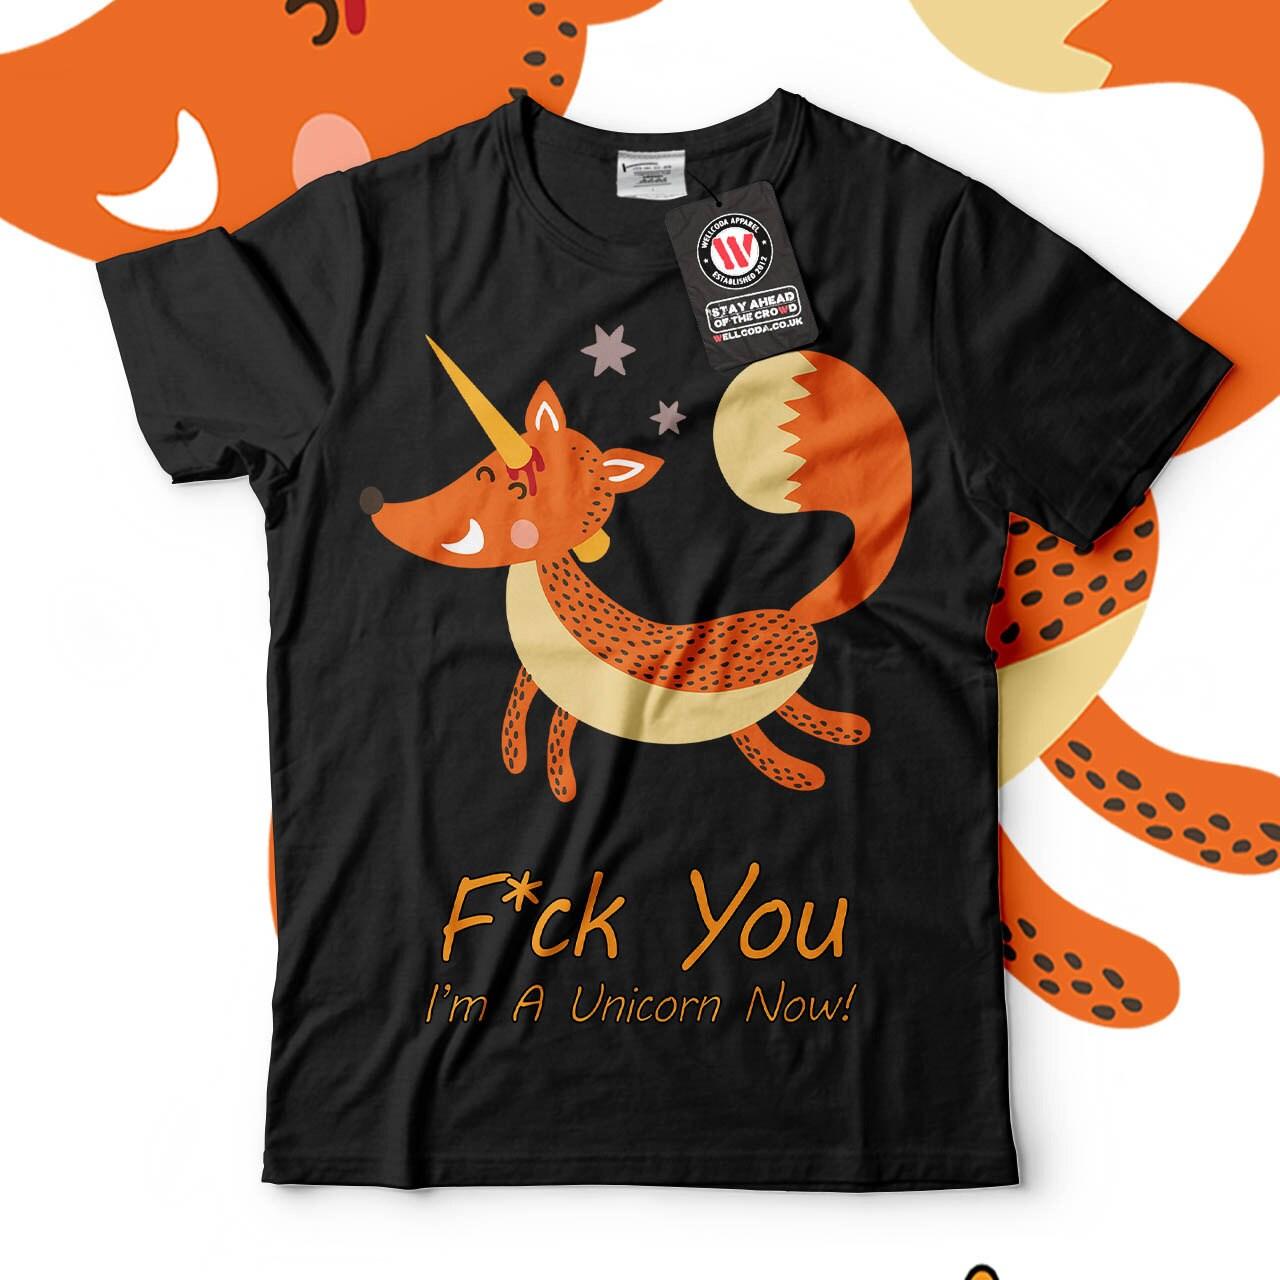 Animal Fox Unicorn Happy Horn Men Black Tshirt S5XL NEW  Wellcoda y275